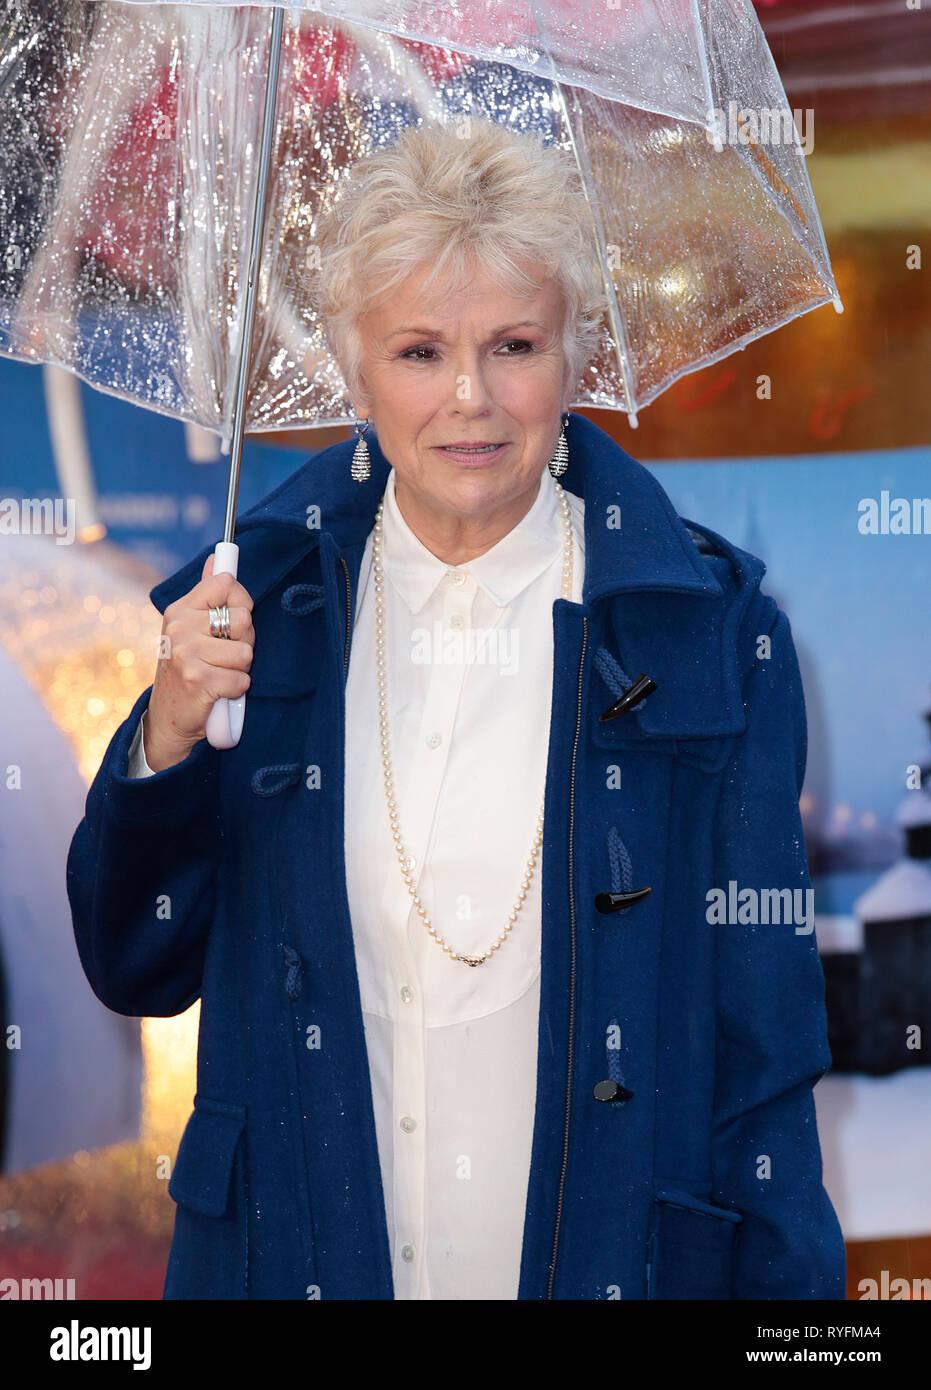 Nov 23, 2014 - London, England, UK - 'Paddington' World Premiere - Red Carpet Arrivals, Odeon, Leicester Square Photo Shows: Julie Walters - Stock Image